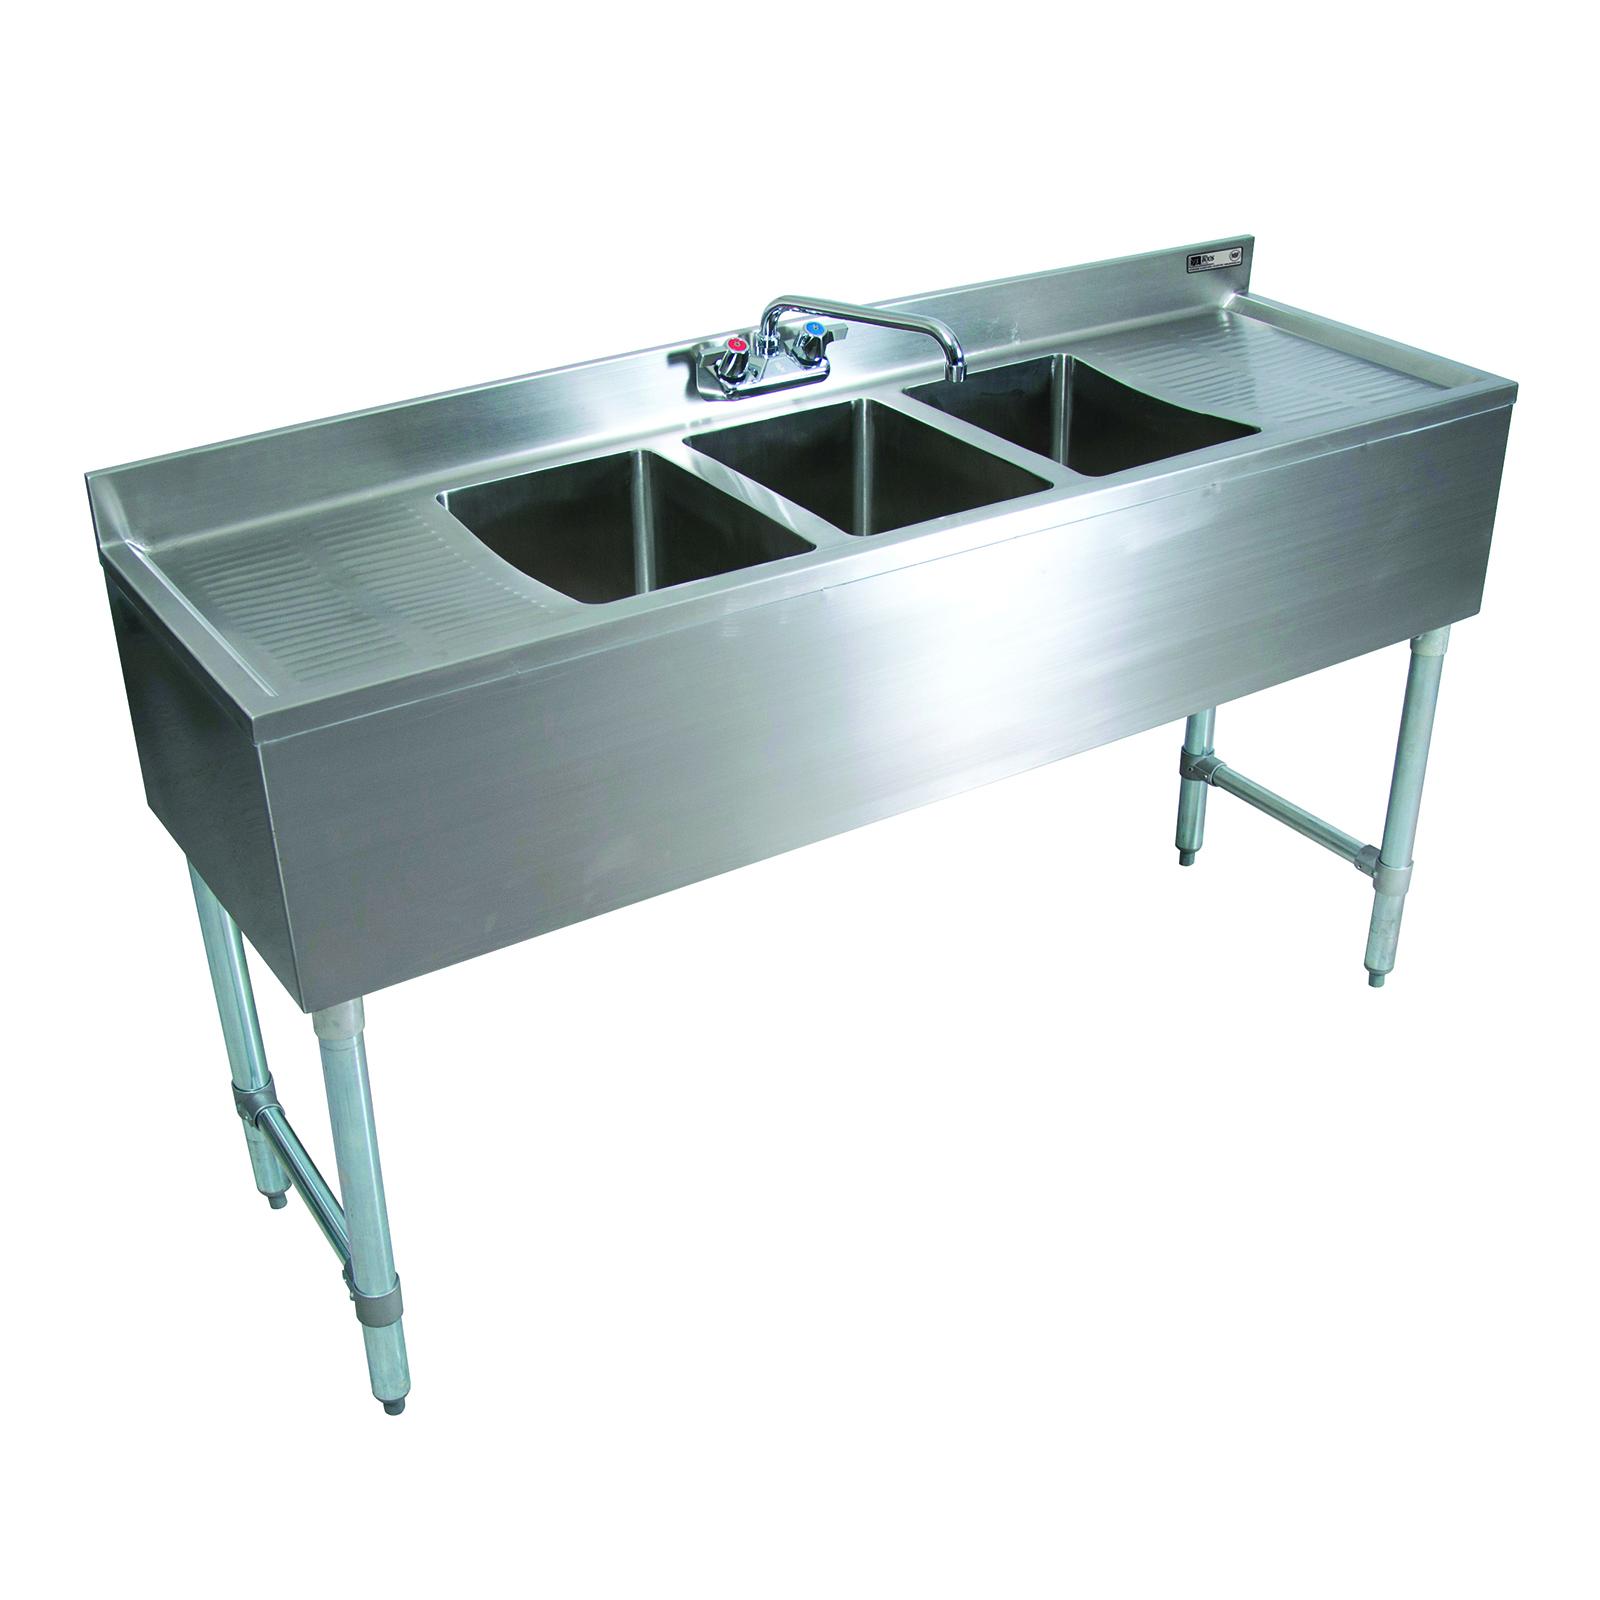 John Boos EUB3S84SL-2D underbar sink units